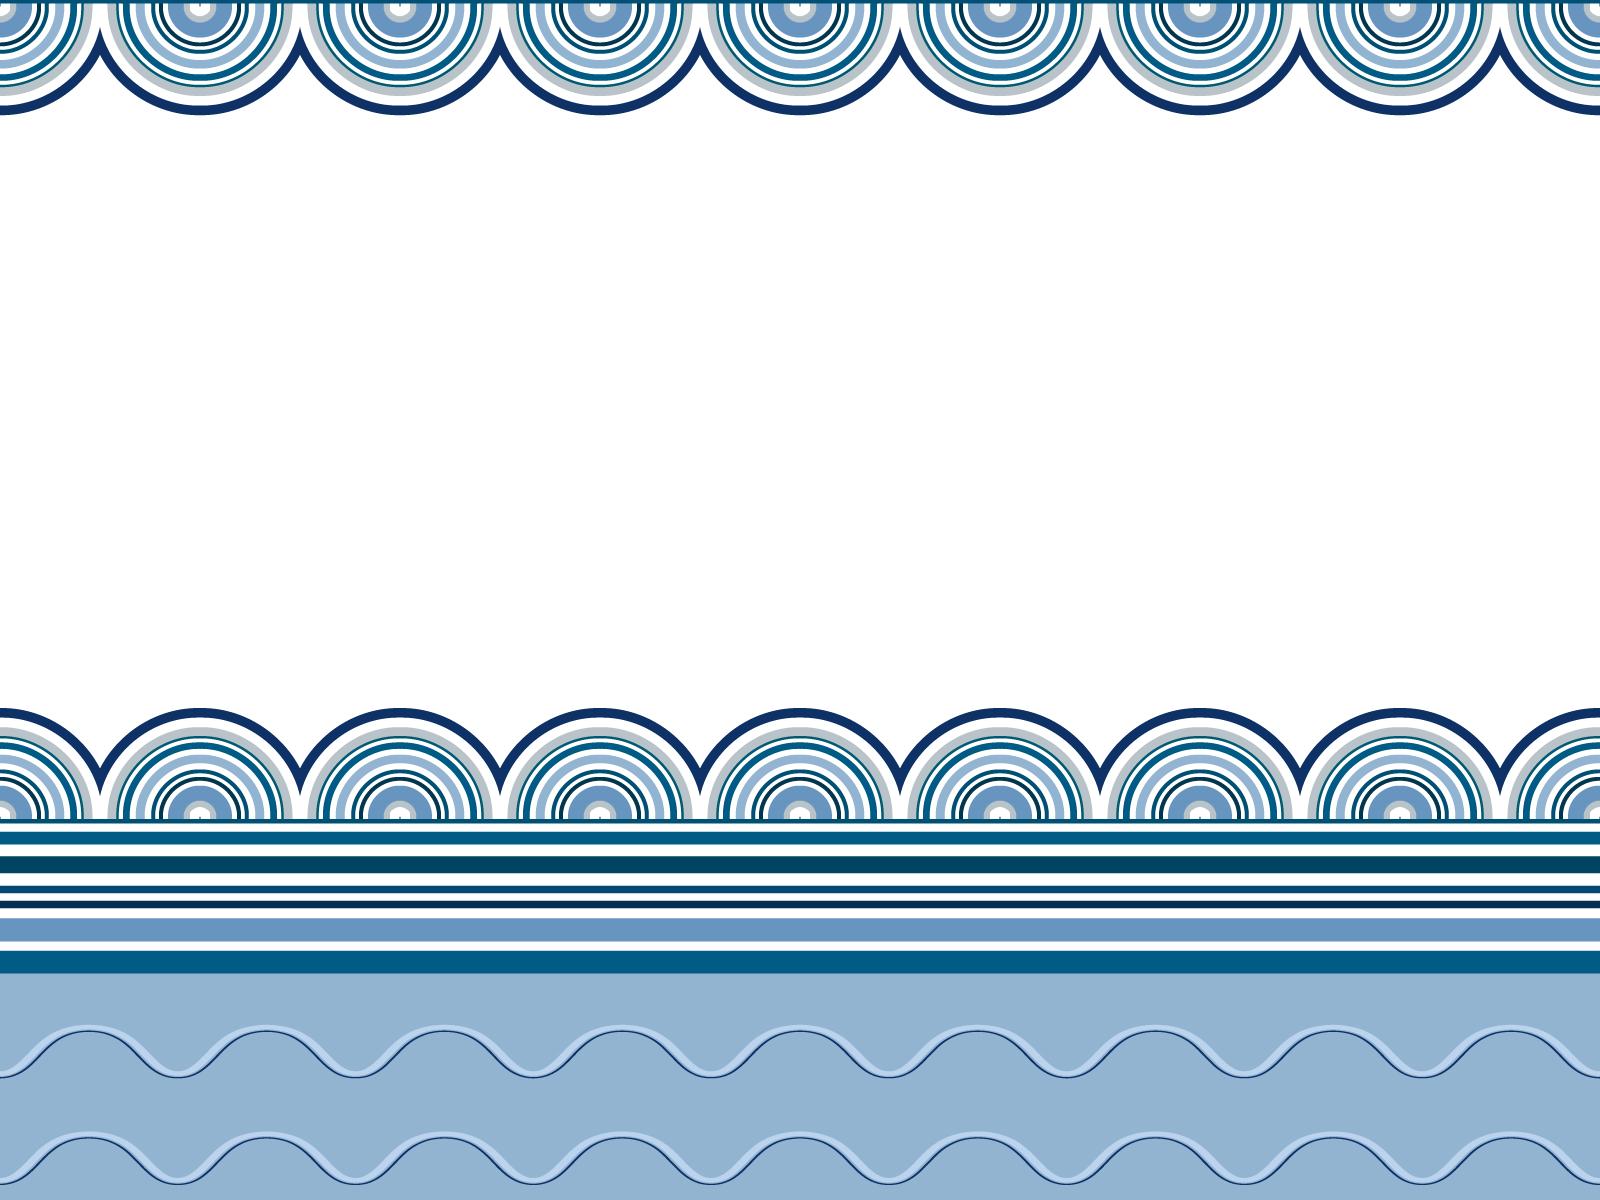 Wavy border frames Backgrounds | Blue, Border & Frames, Navy ...